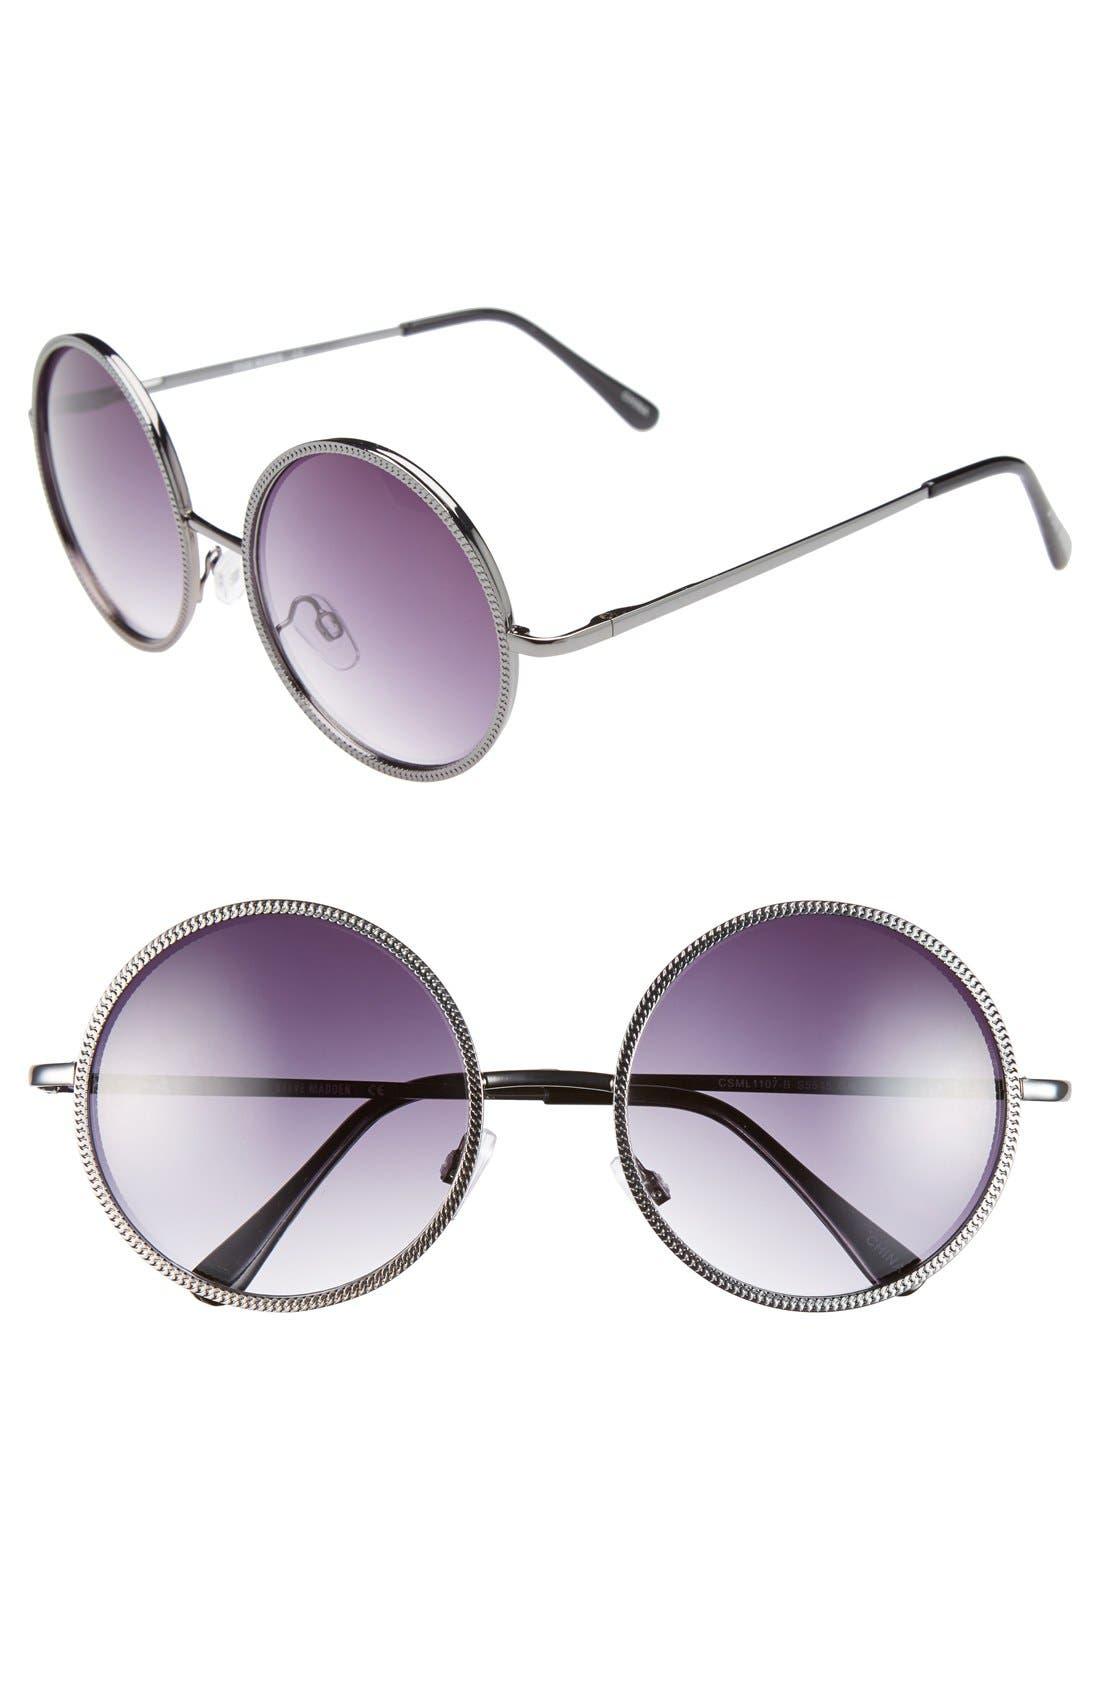 Main Image - Steve Madden 54mm Round Sunglasses